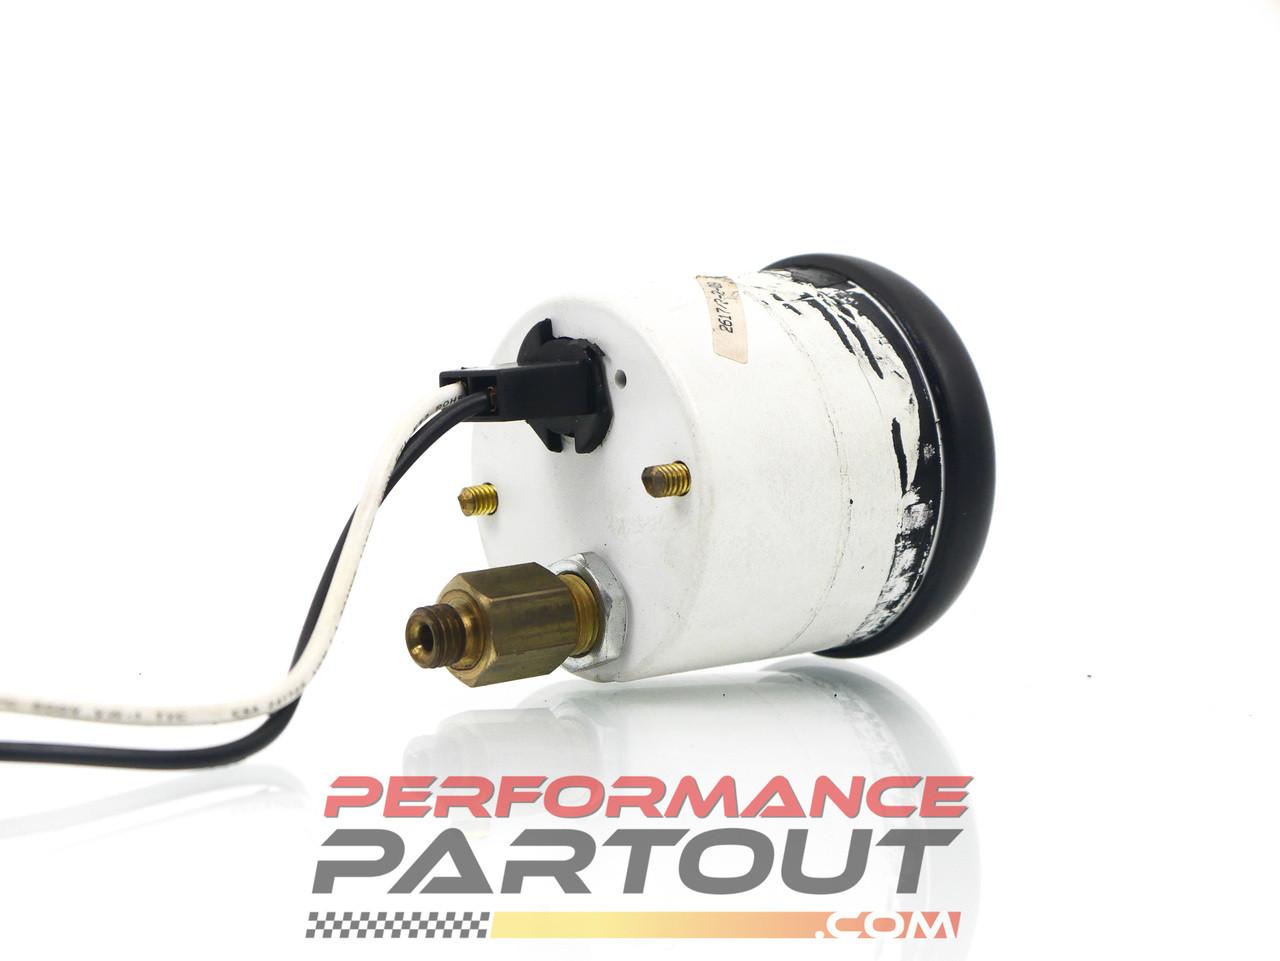 Autometer boost gauge Z Series 2617 60psi